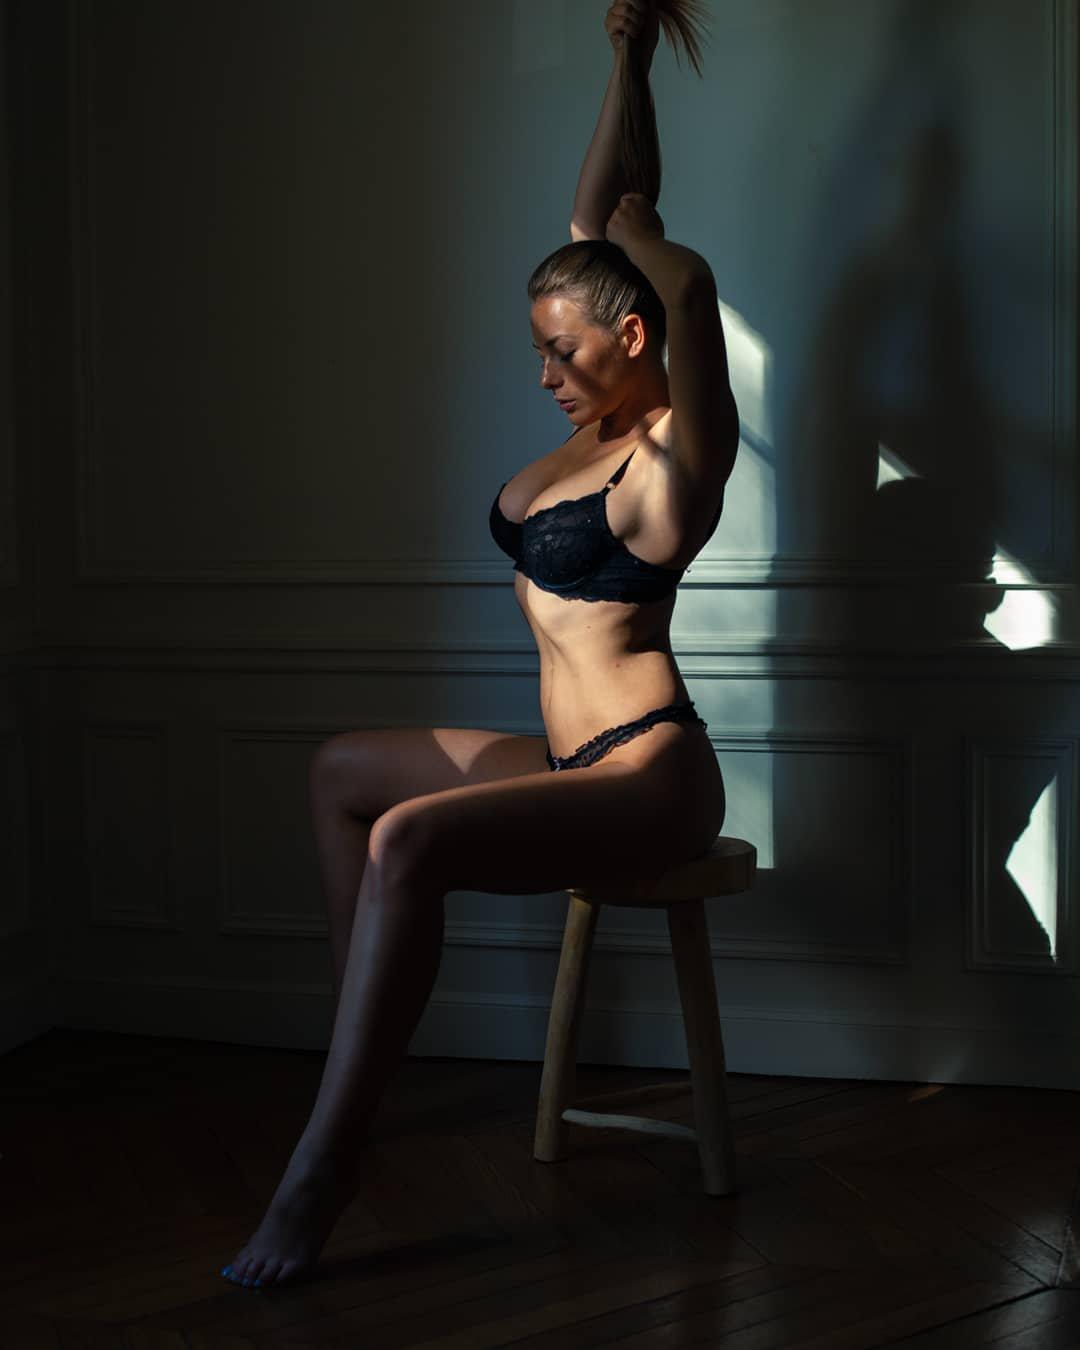 Olga Kobzar - Busty Russian Model Nudes - Page 3 of 4